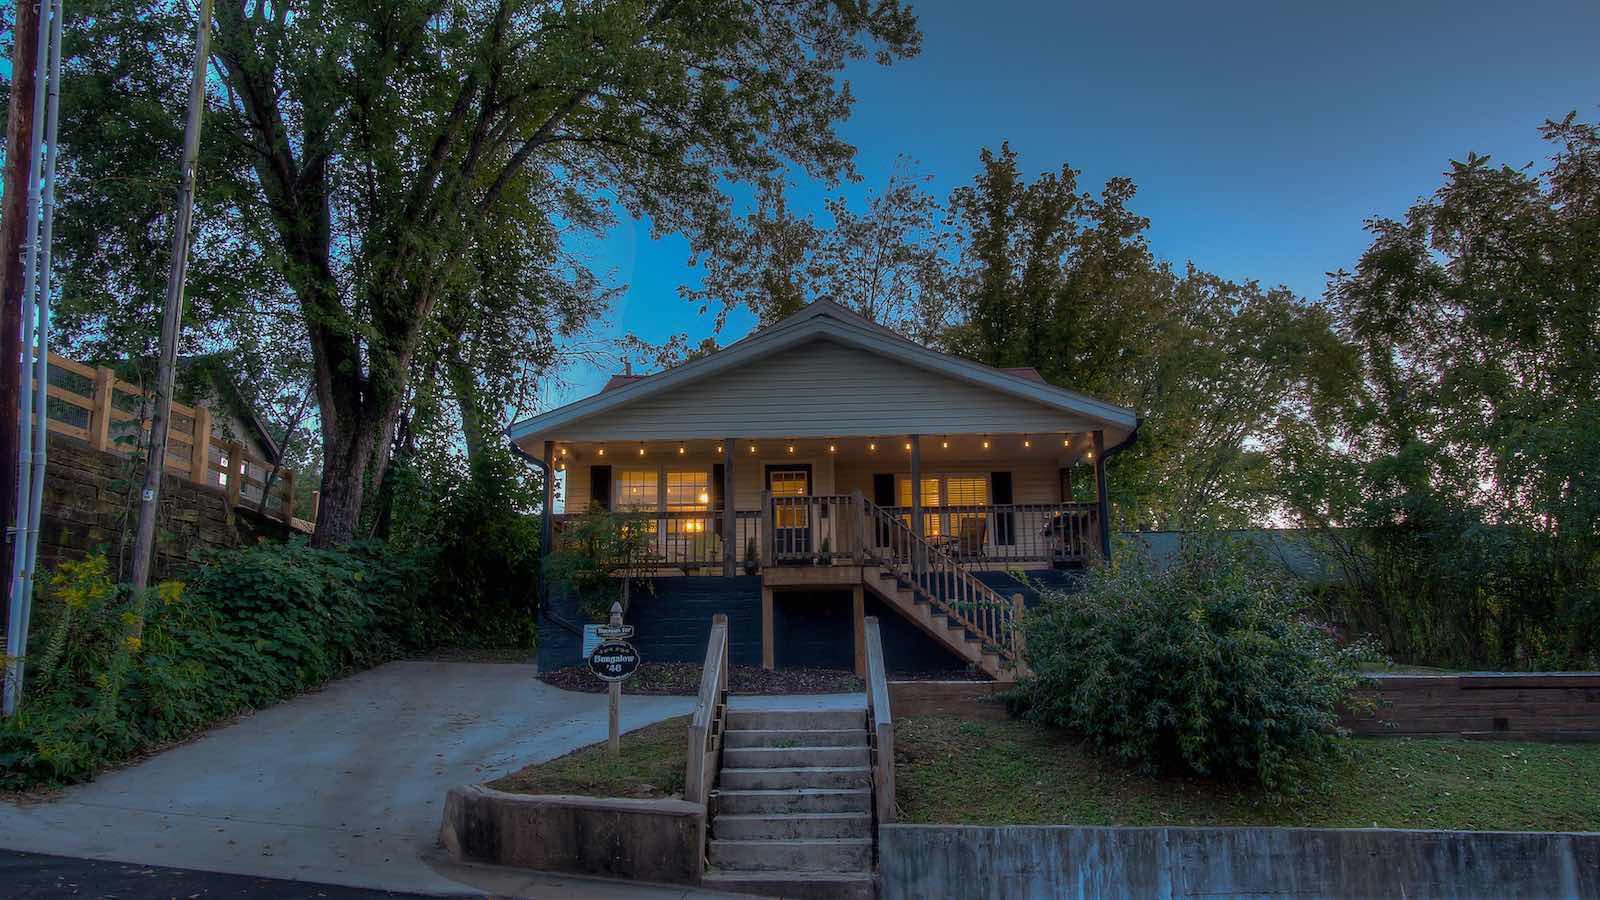 Bungalow Cabin Part - 16: Bungalow U002746 Cabin Rental. « »